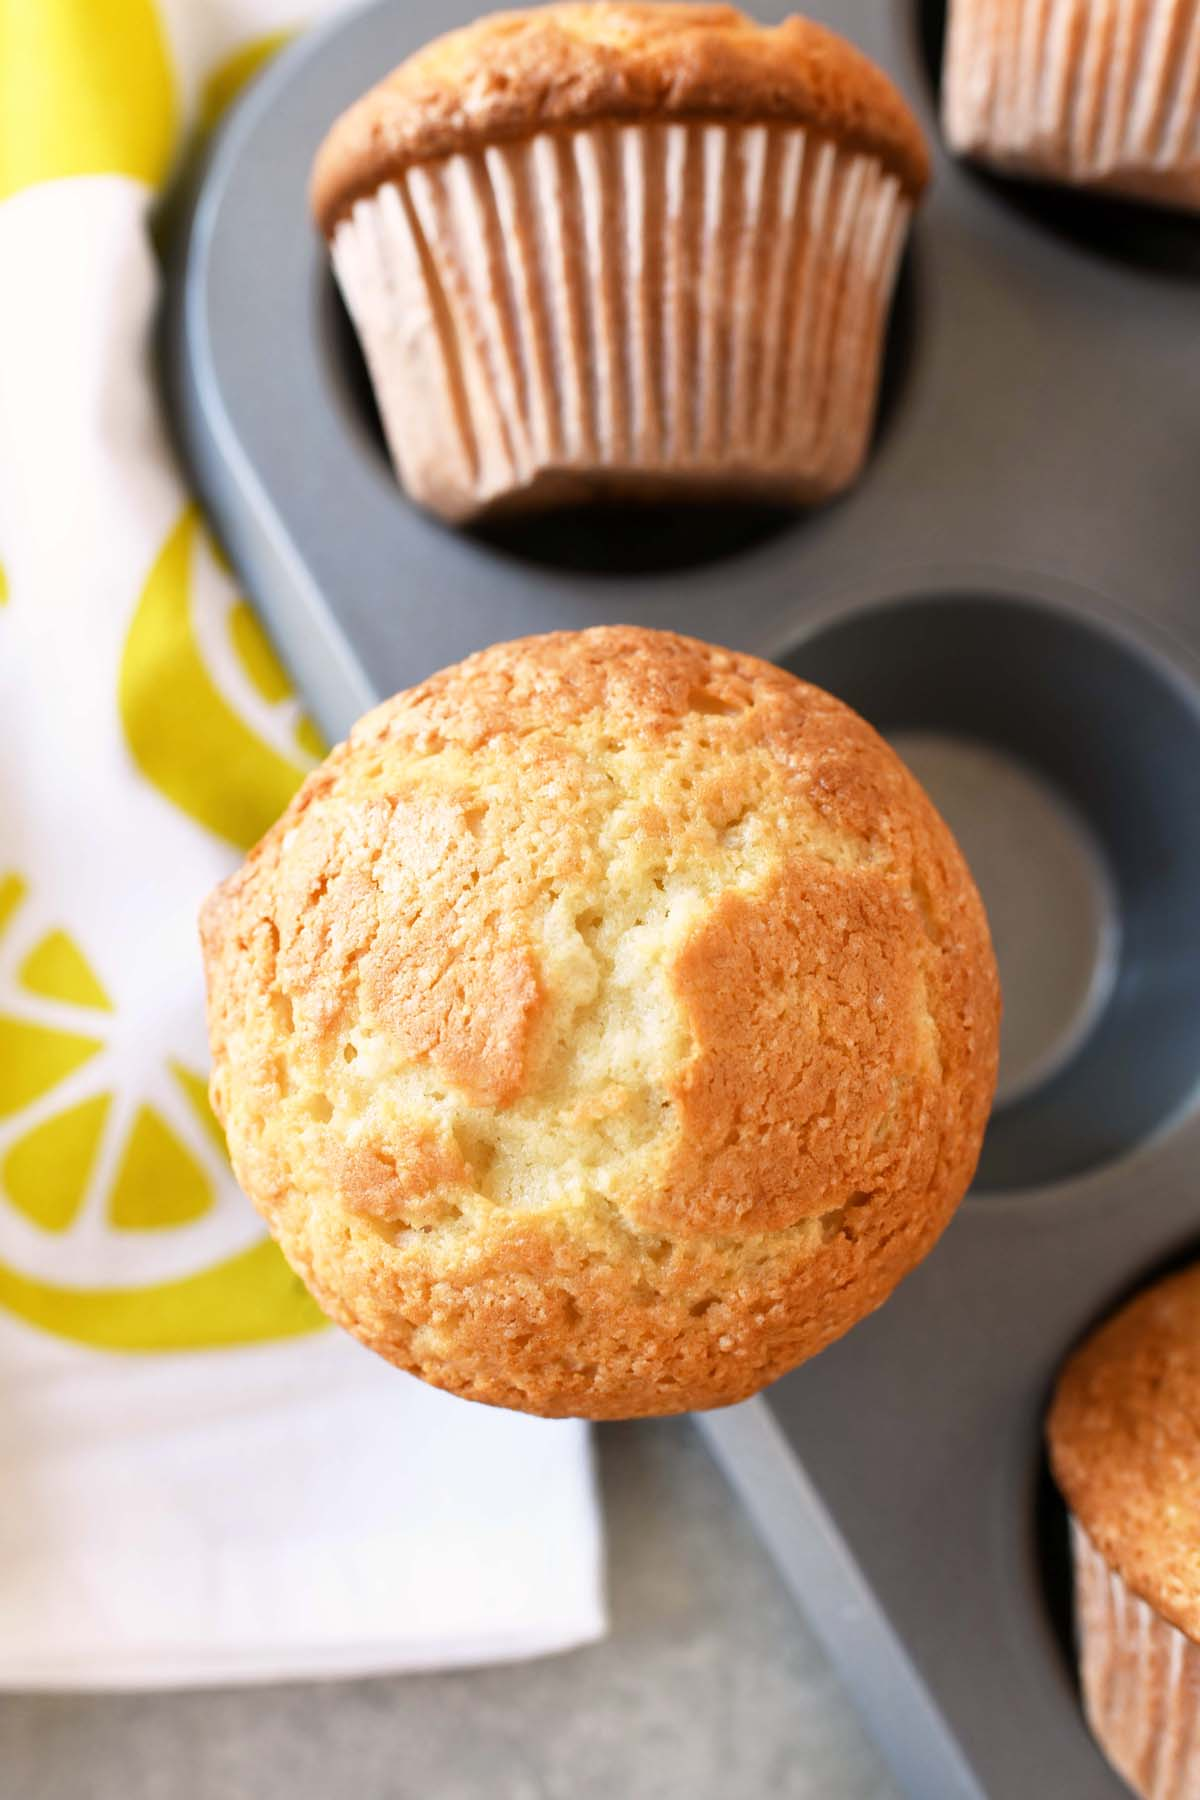 Lemon Burst Muffins - a single lemon outside of a muffin tin.